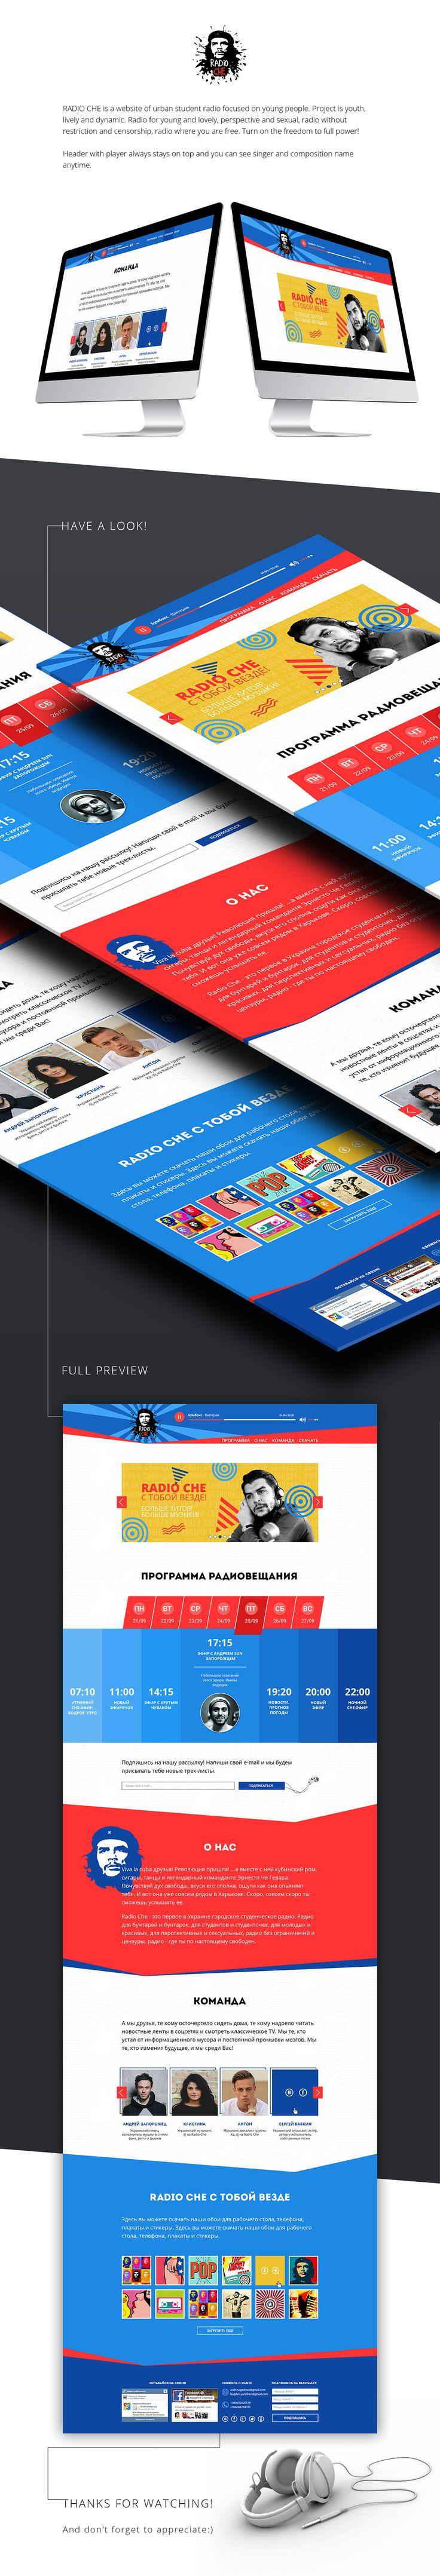 Radio Che Landing page on Behance